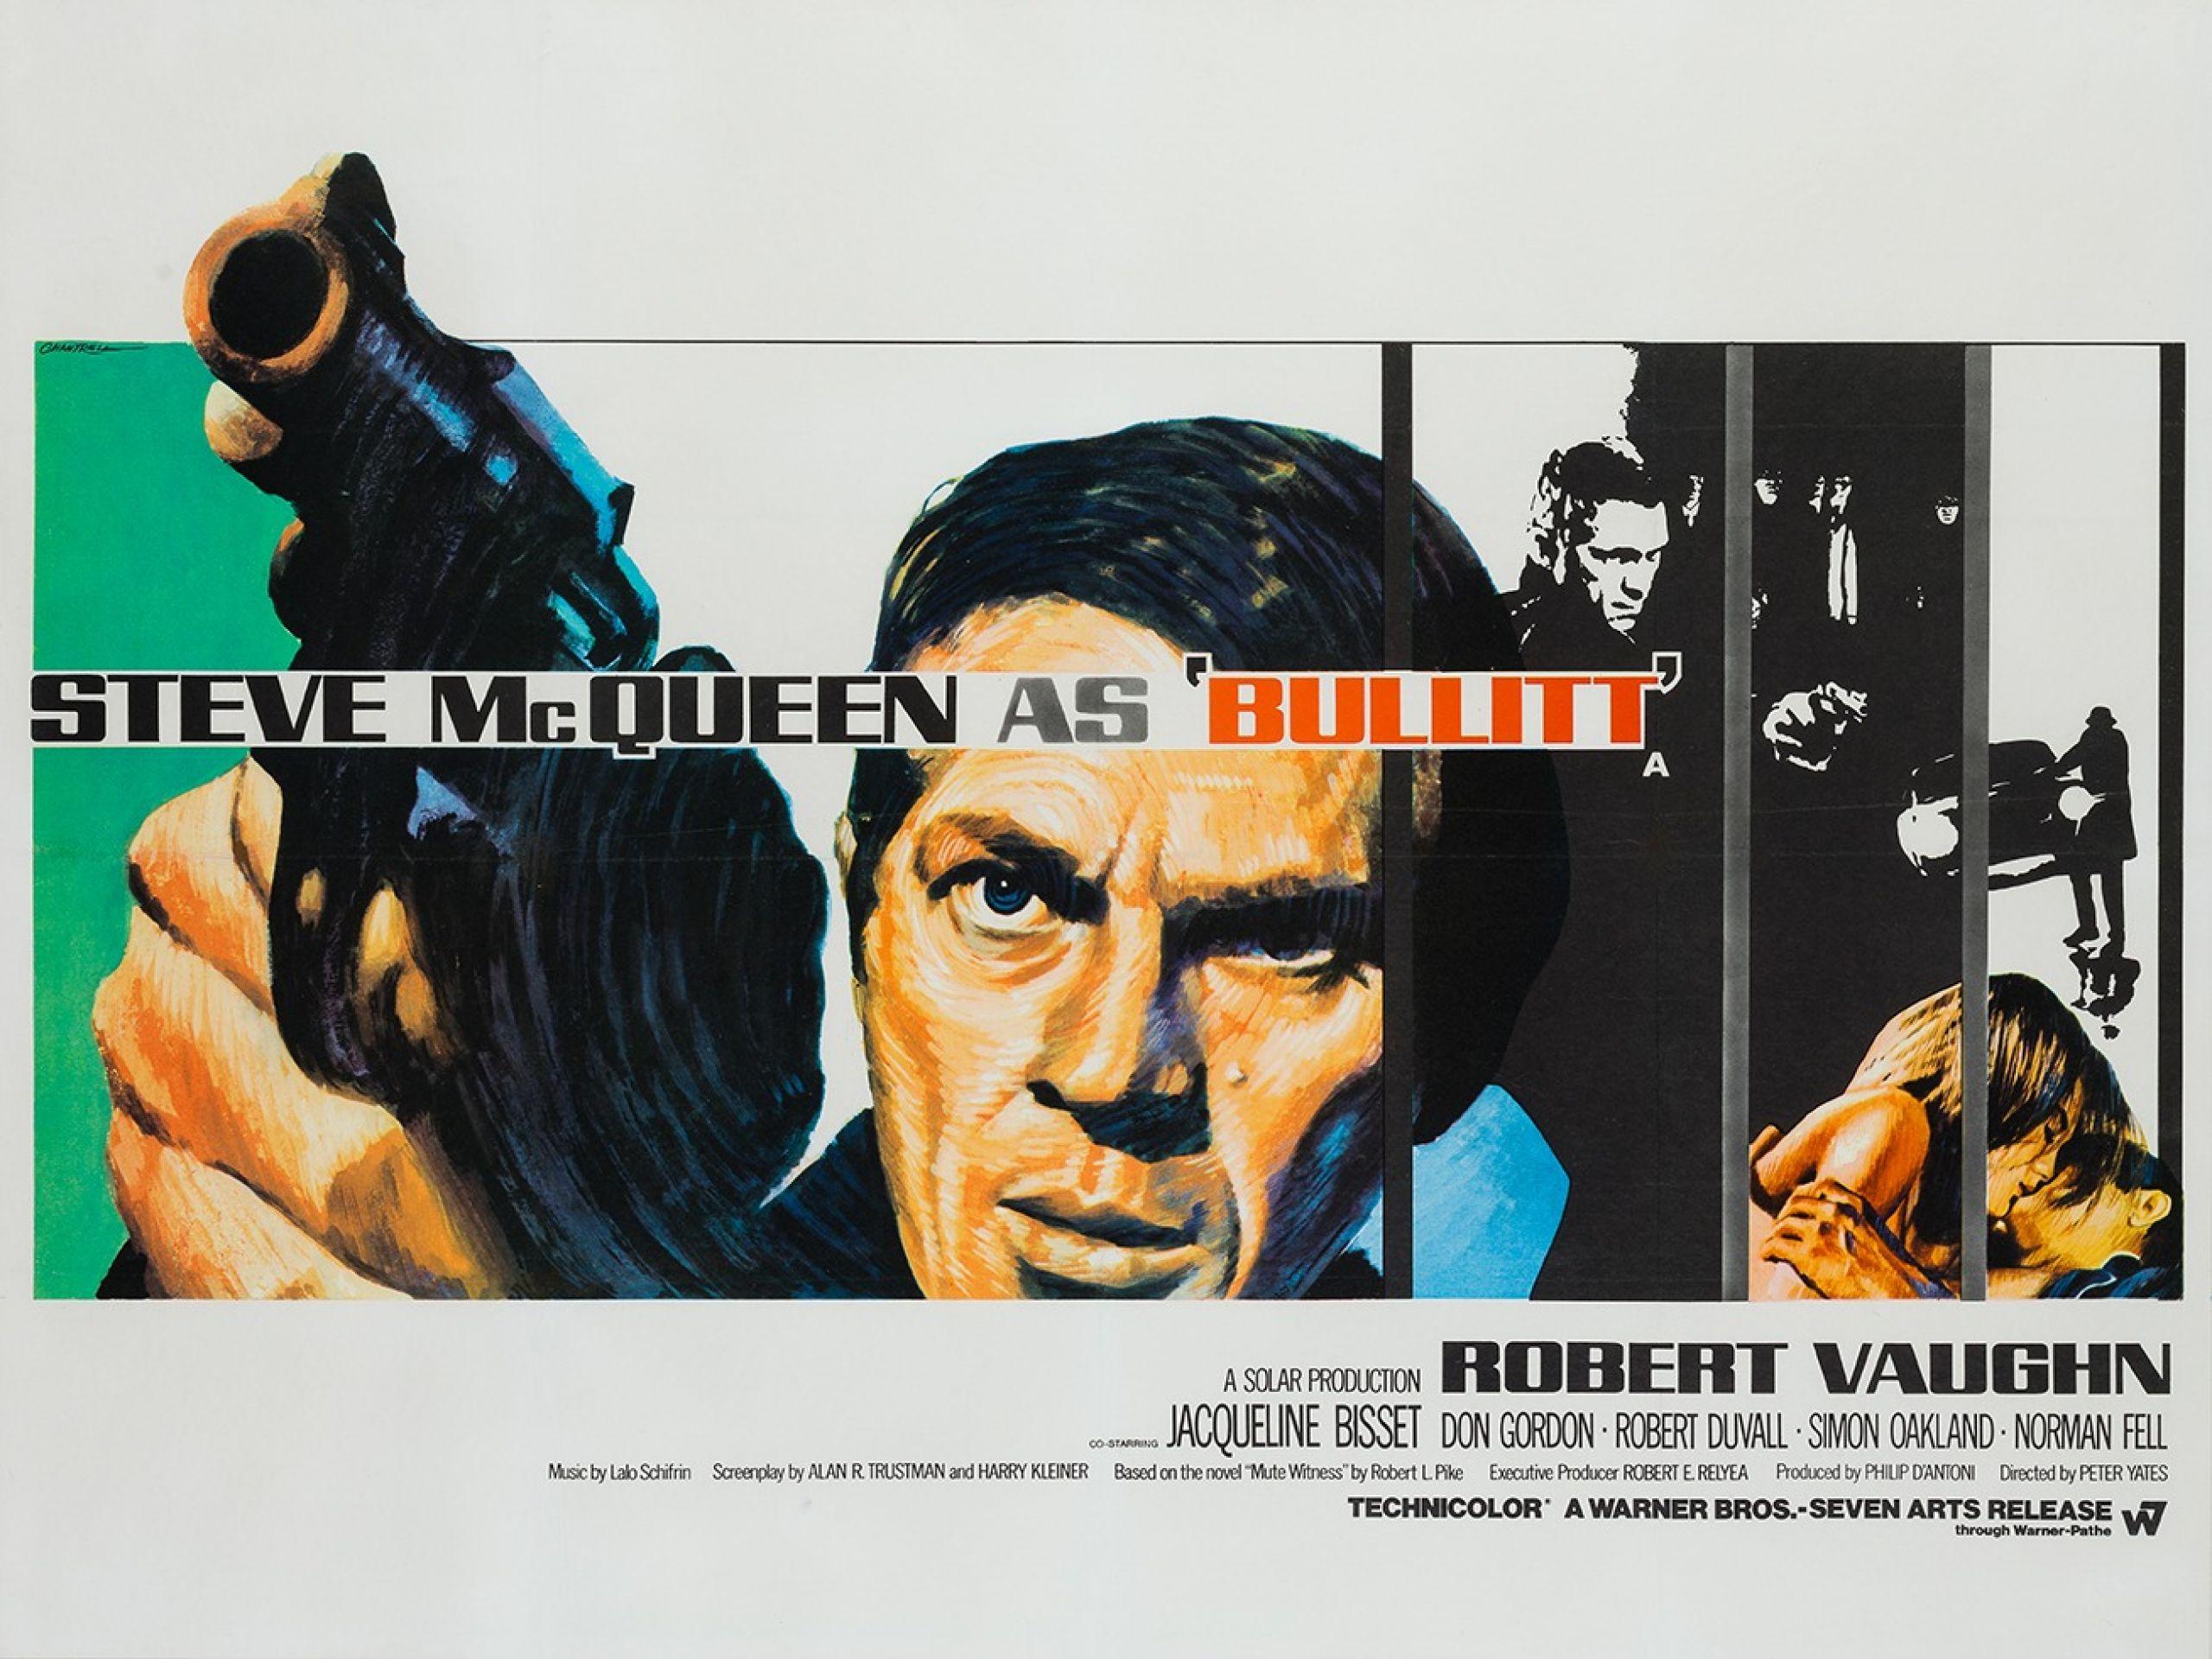 Original Bullitt 1968 British Film Movie Poster, Tom Chantrell, Steve McQueen